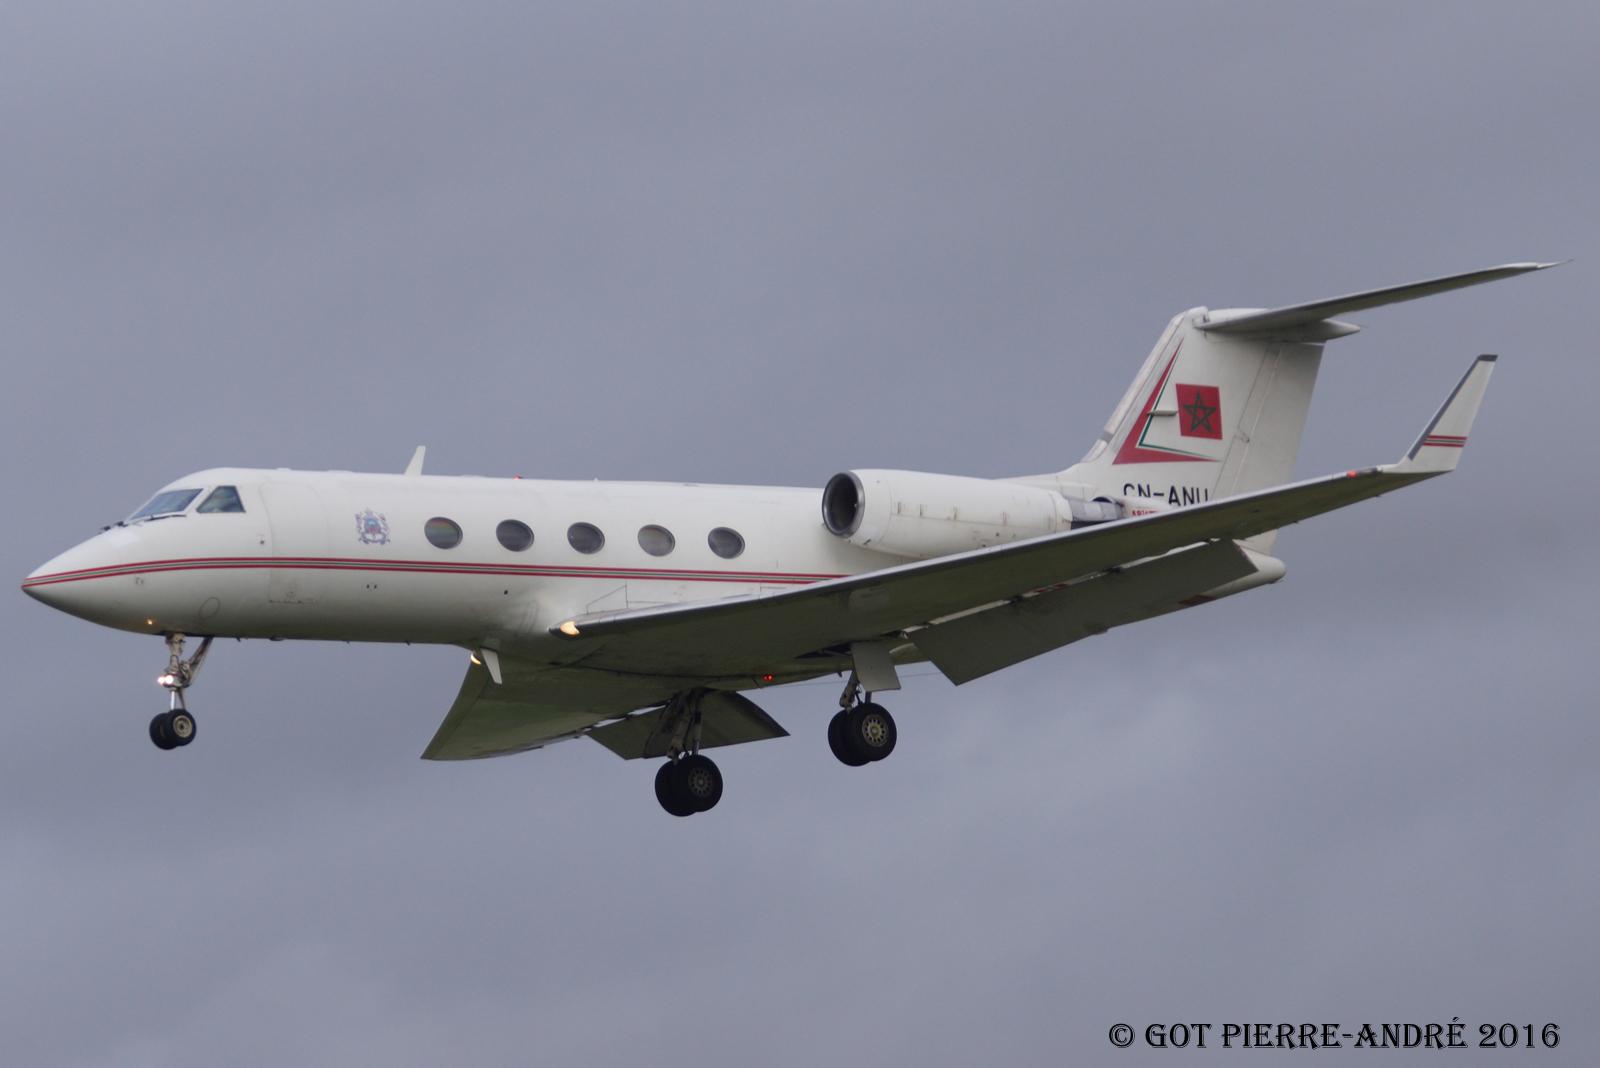 FRA: Avions VIP, Liaison & ECM - Page 12 25438035796_498b4879c7_o